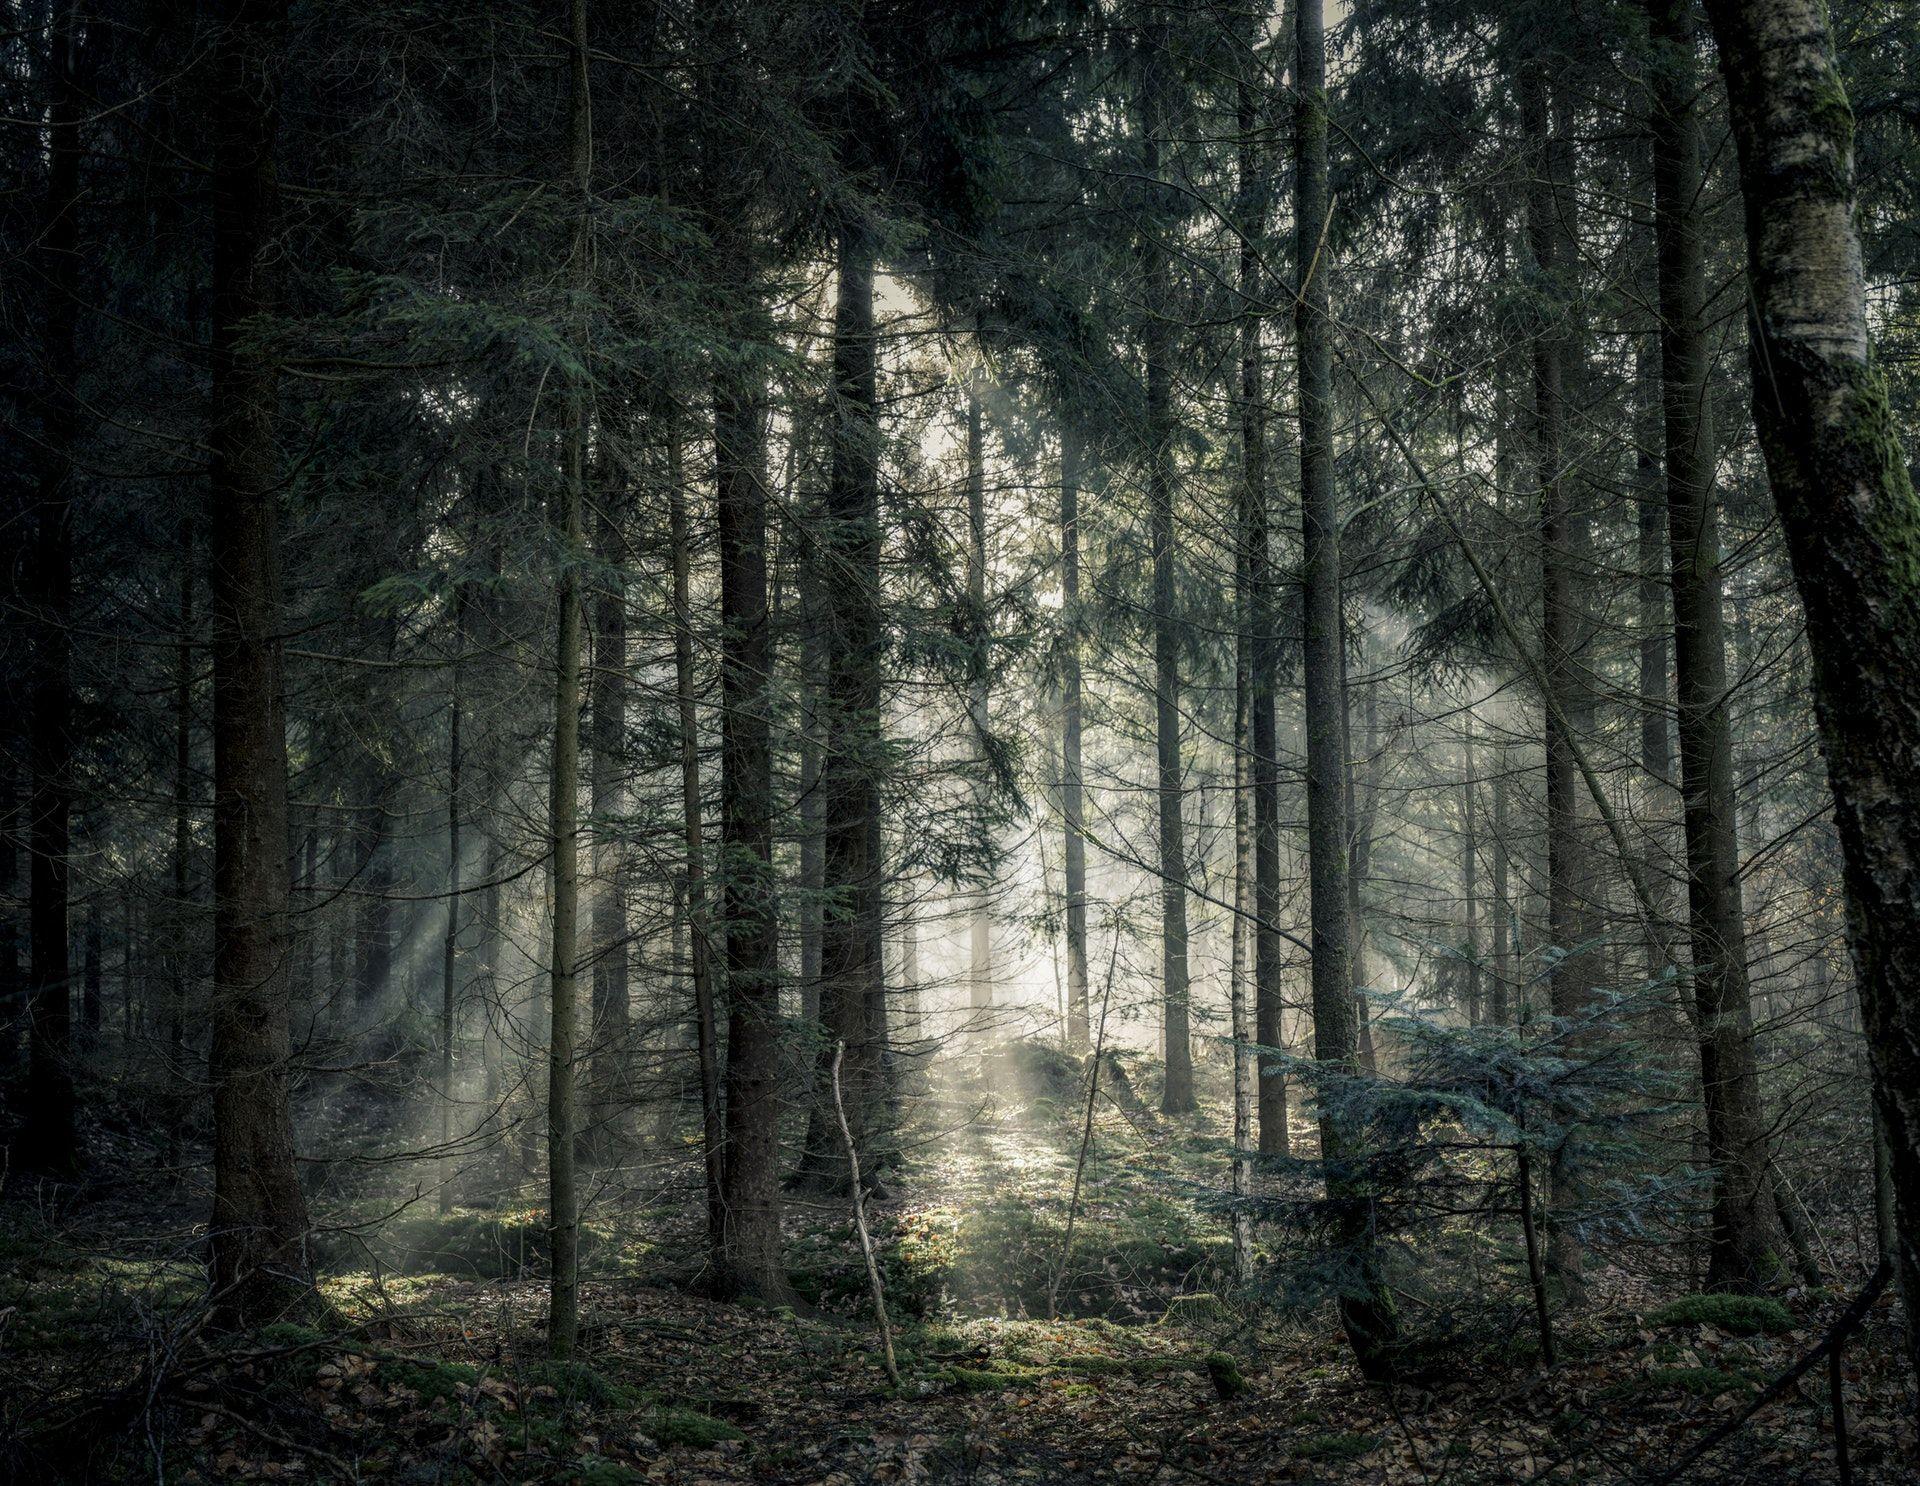 عکس زمینه درخت سبز جنگل تاریک پس زمینه